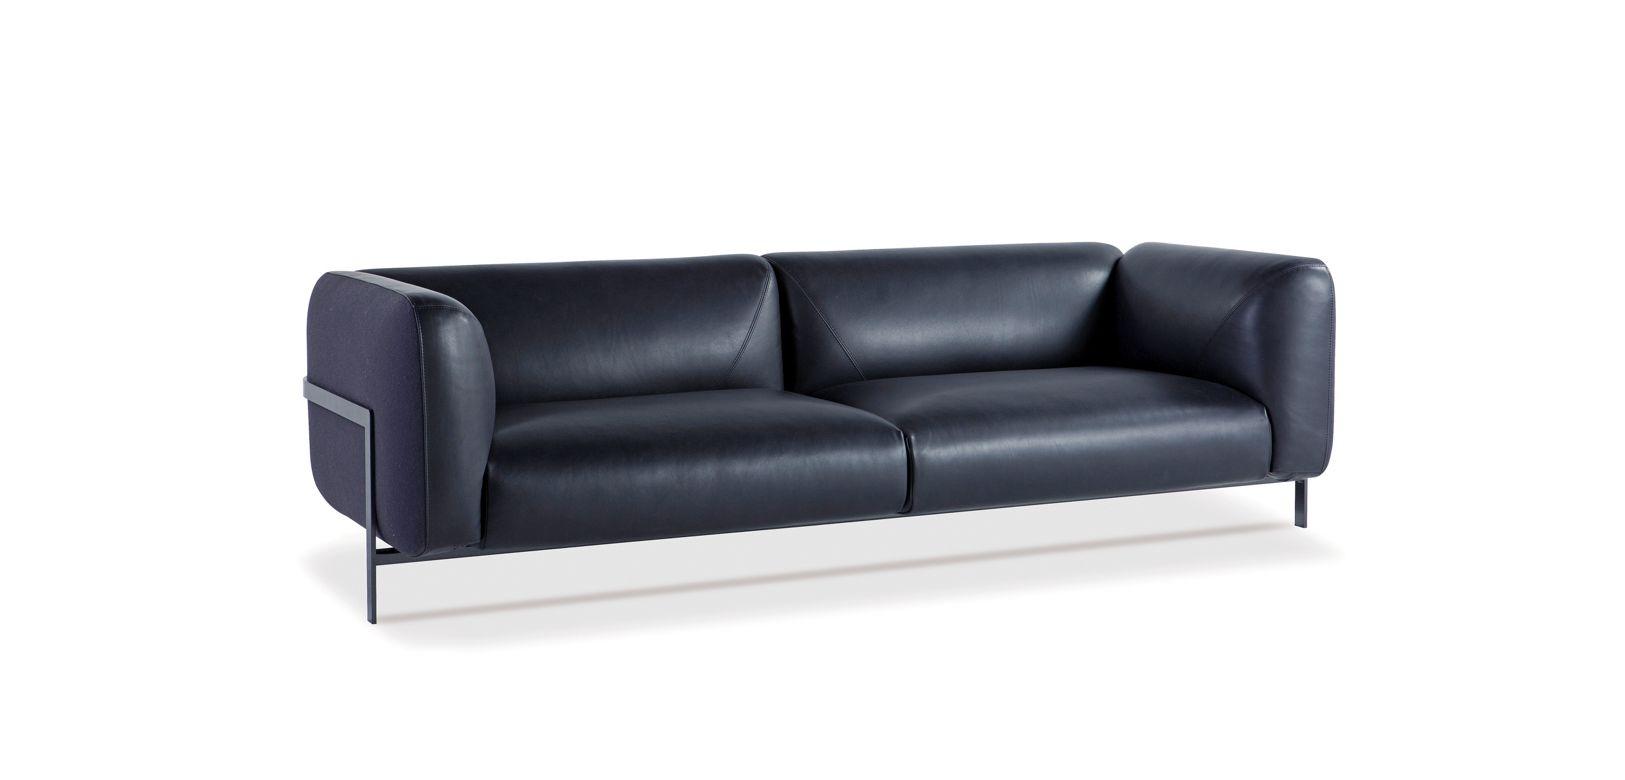 gro es 3 sitzer sofa lobby roche bobois. Black Bedroom Furniture Sets. Home Design Ideas